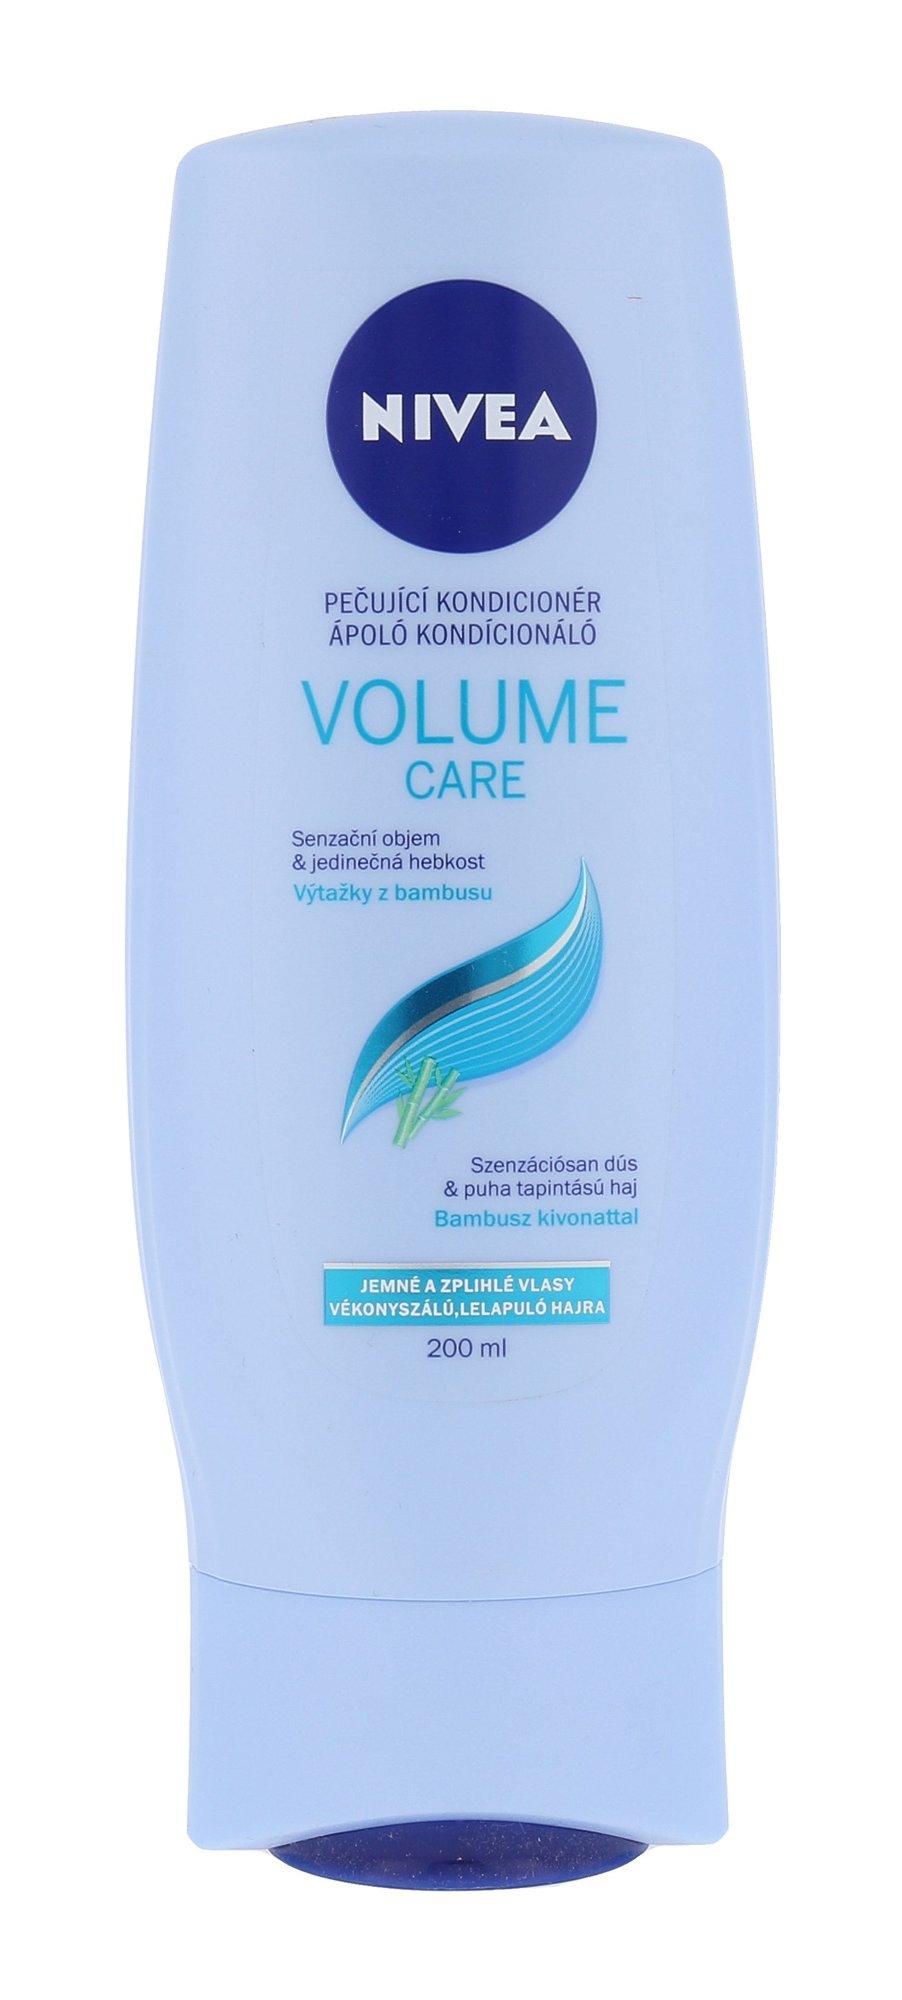 Plaukų kondicionierius Nivea Volume Care